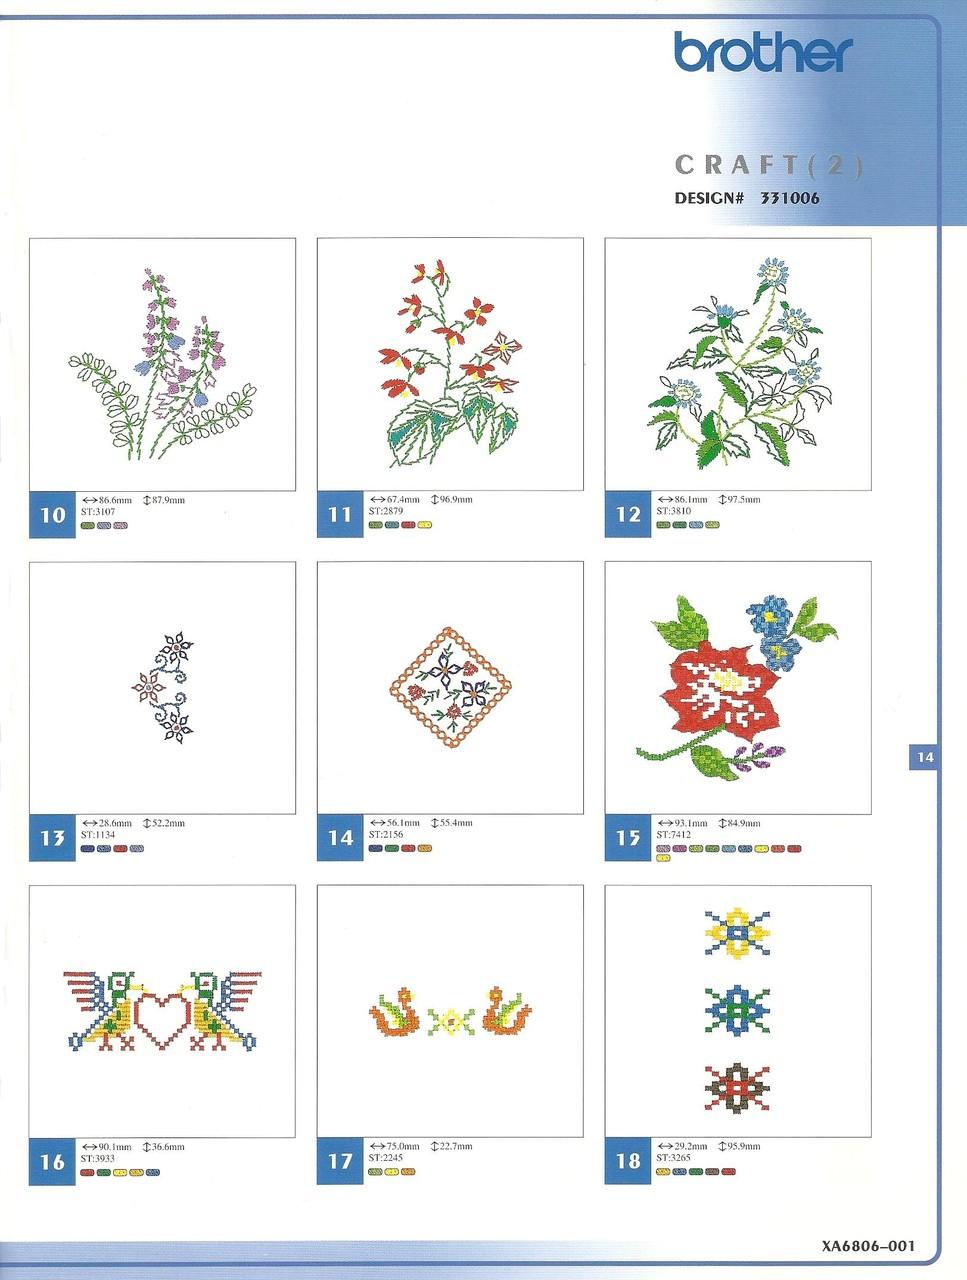 331006 Crafts II-2